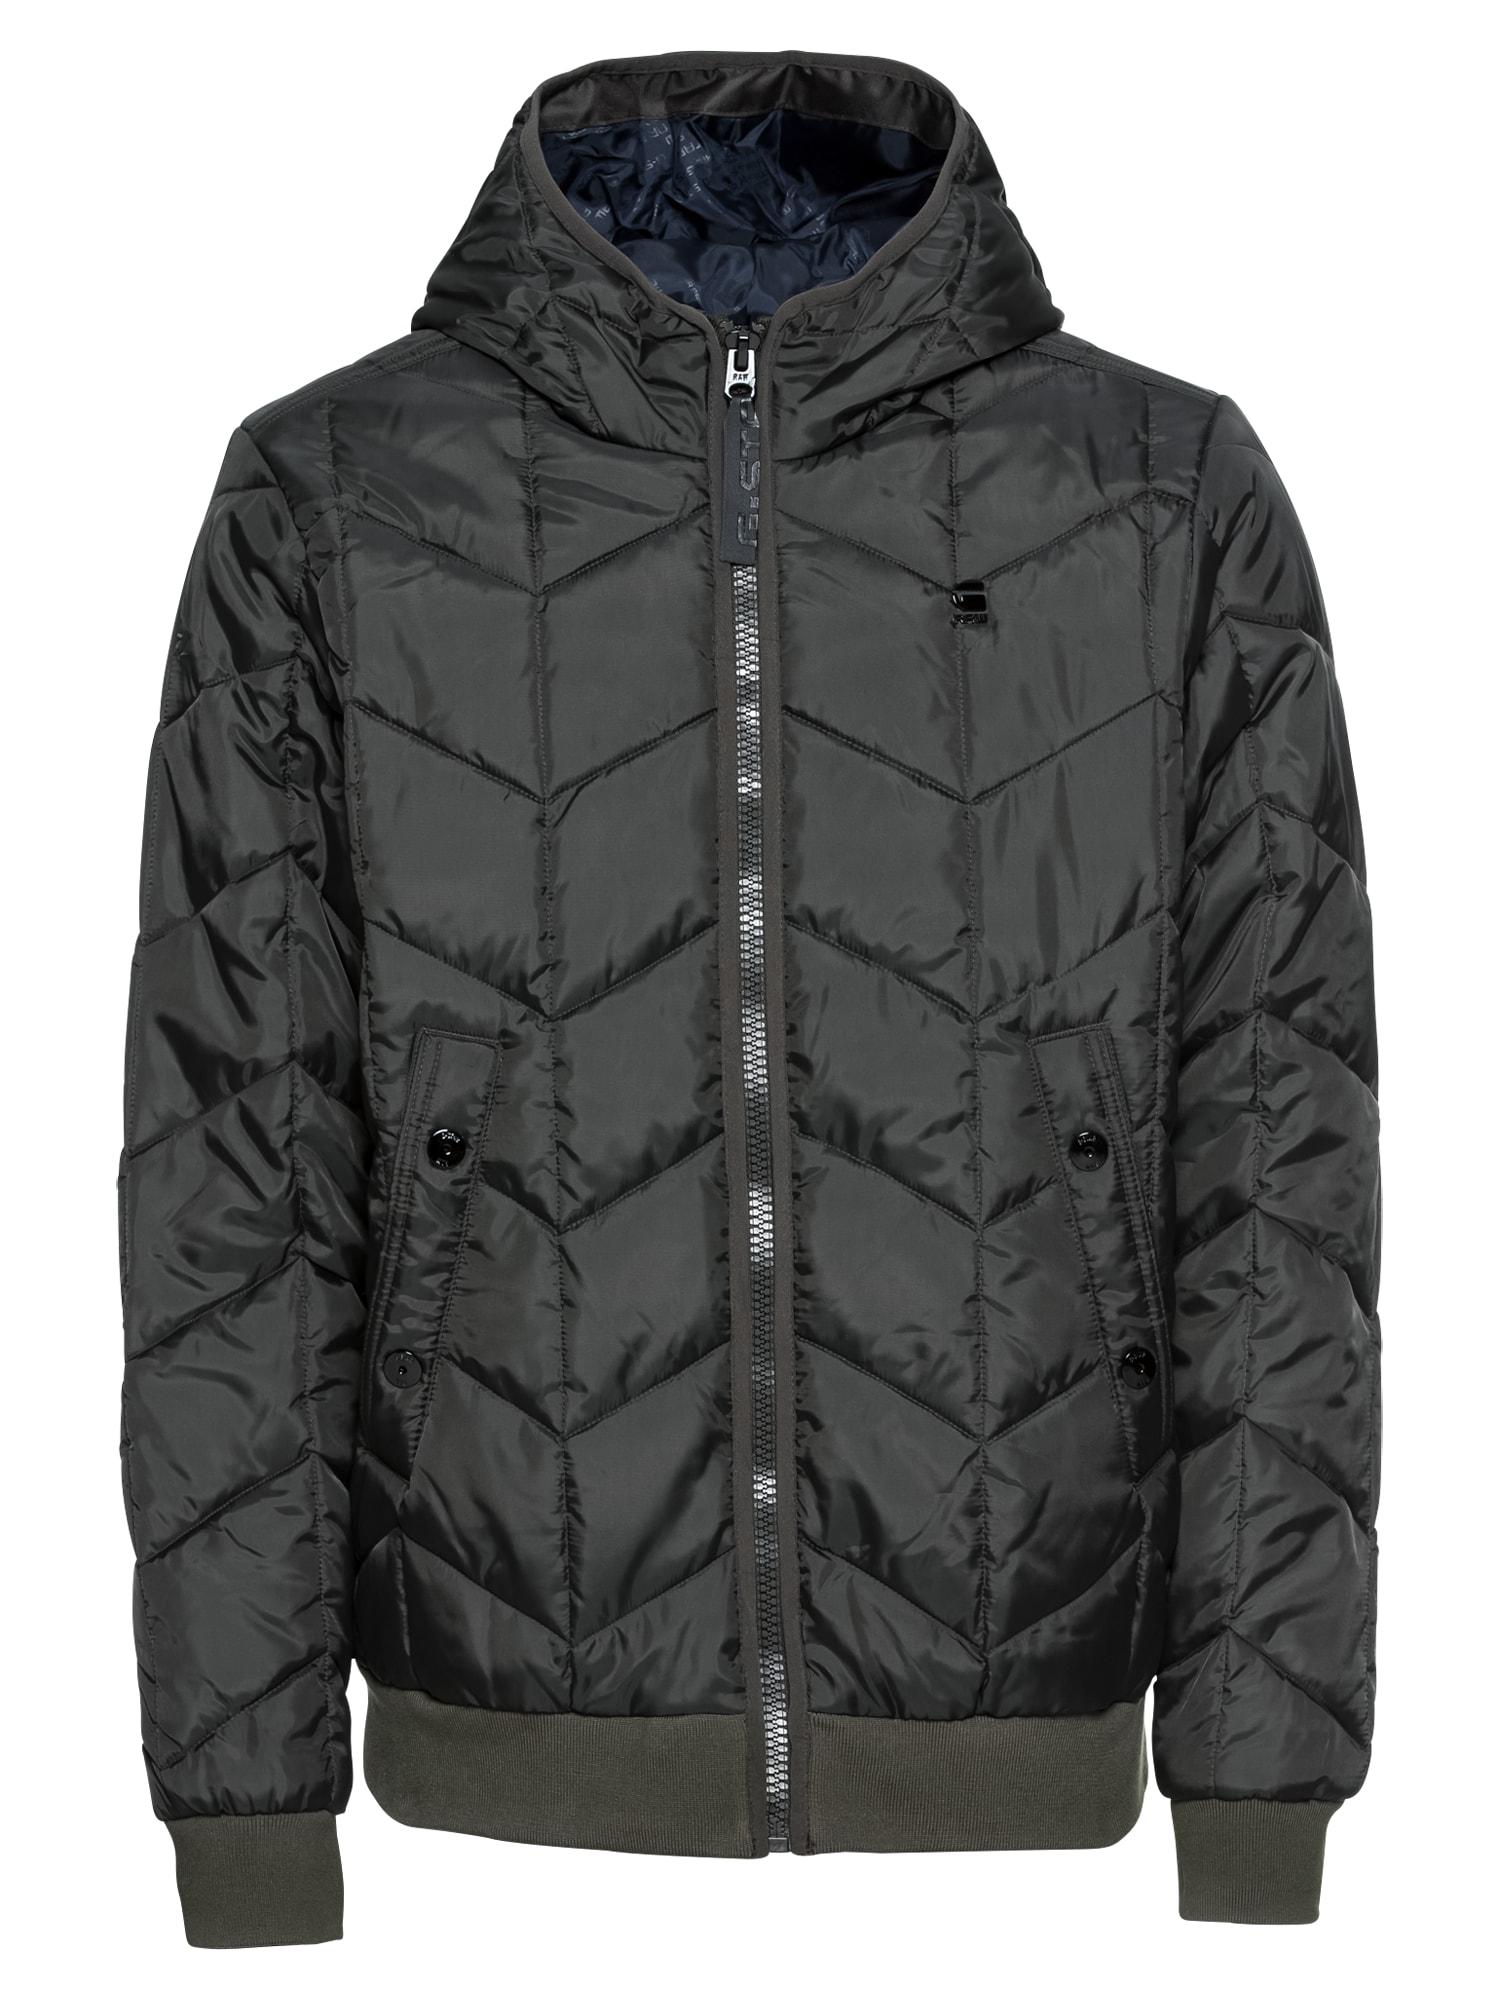 Zimní bunda Whistler meefic quilted hdd bomber tmavě šedá G-STAR RAW